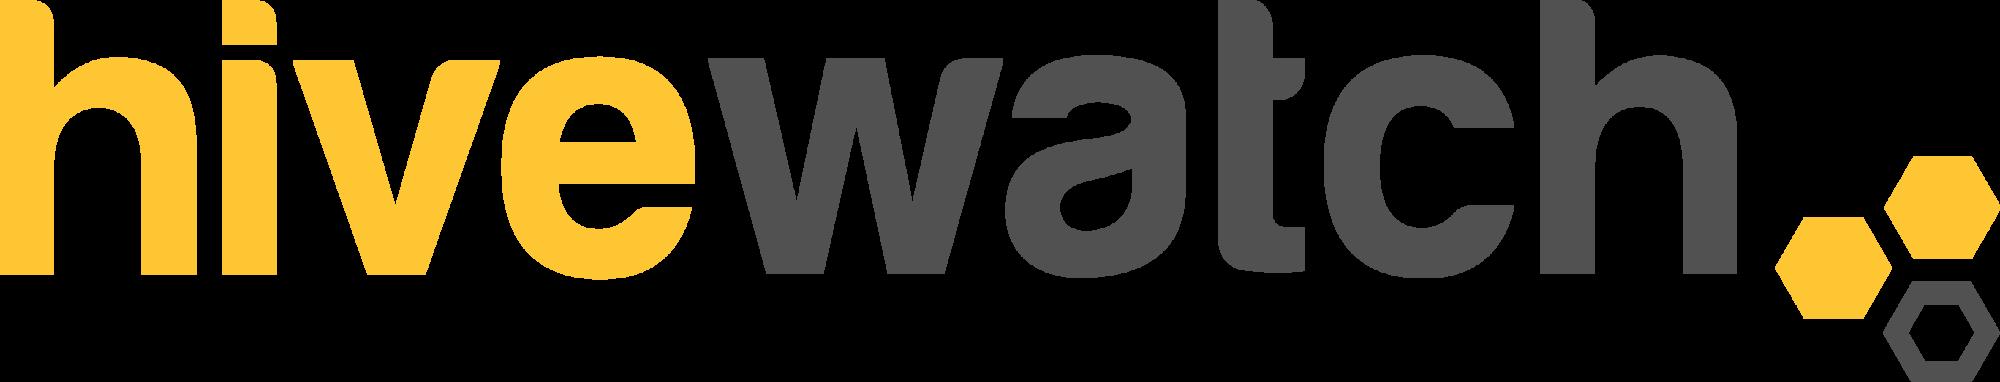 logo Hivewatch